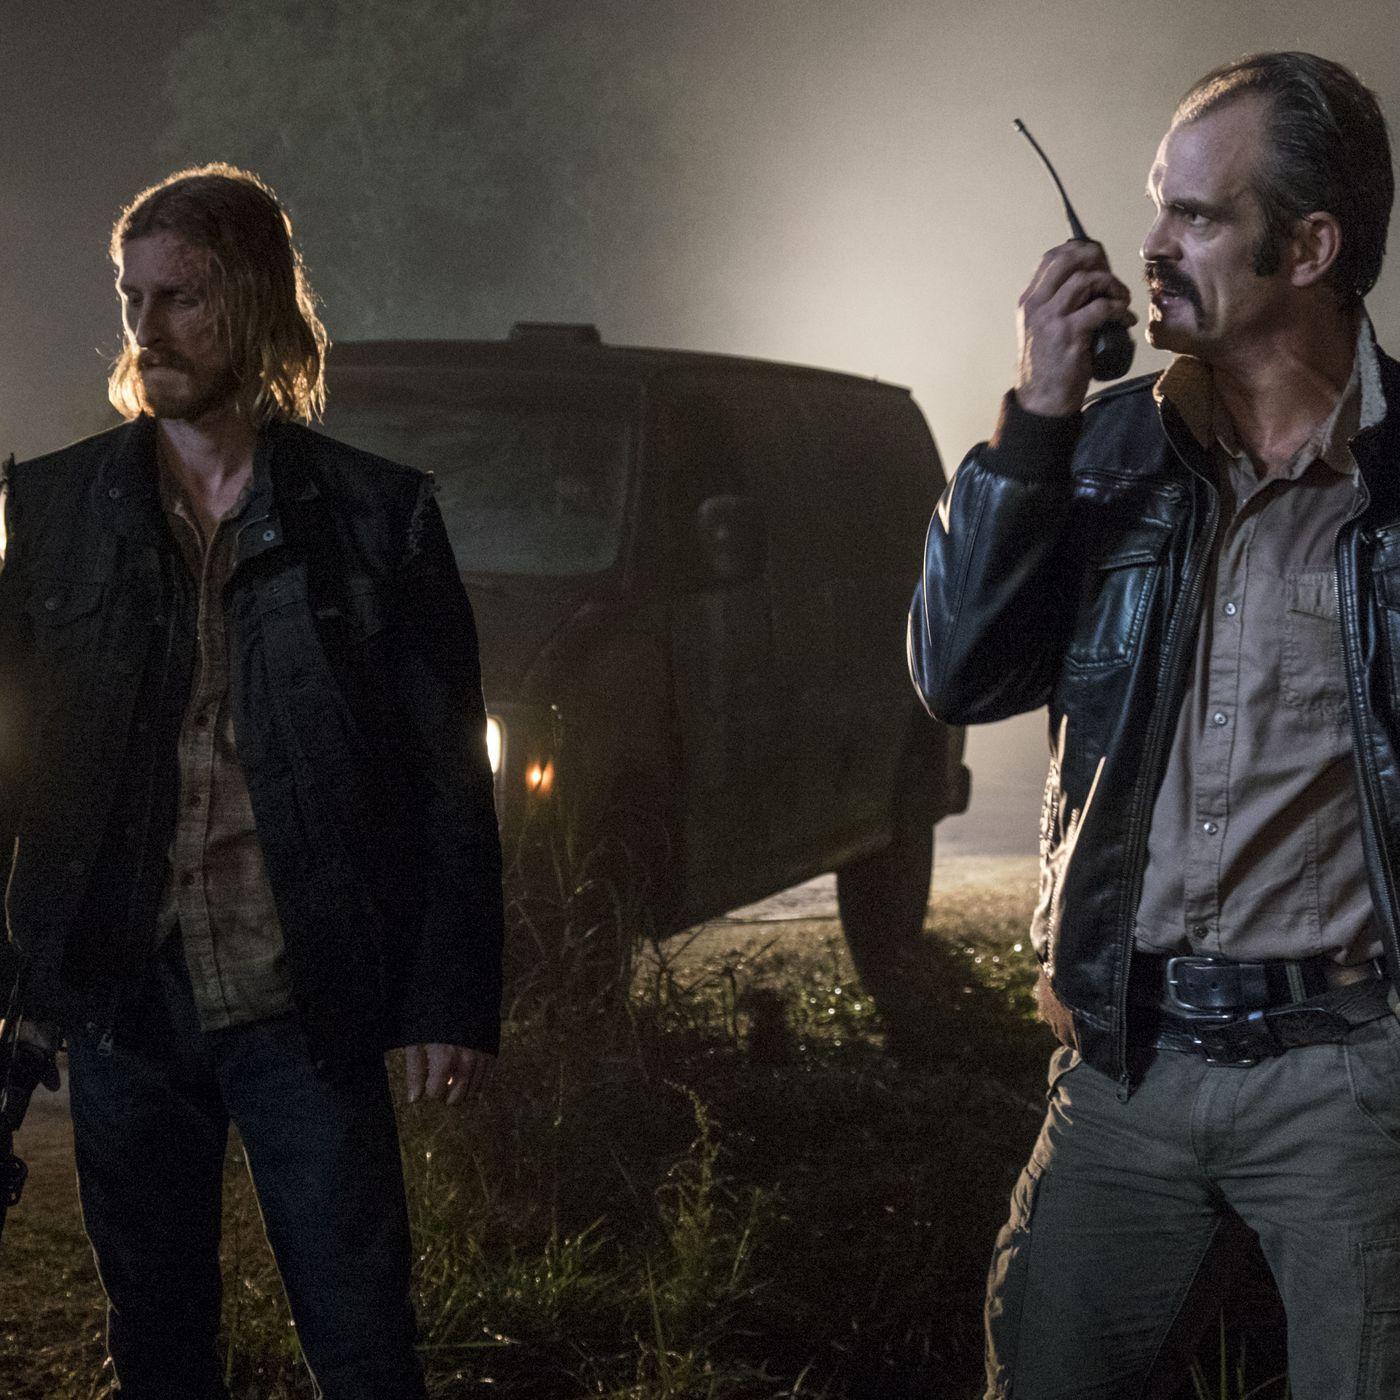 The Walking Dead Villain Watch Season 8 Episode 13 Do Not Send